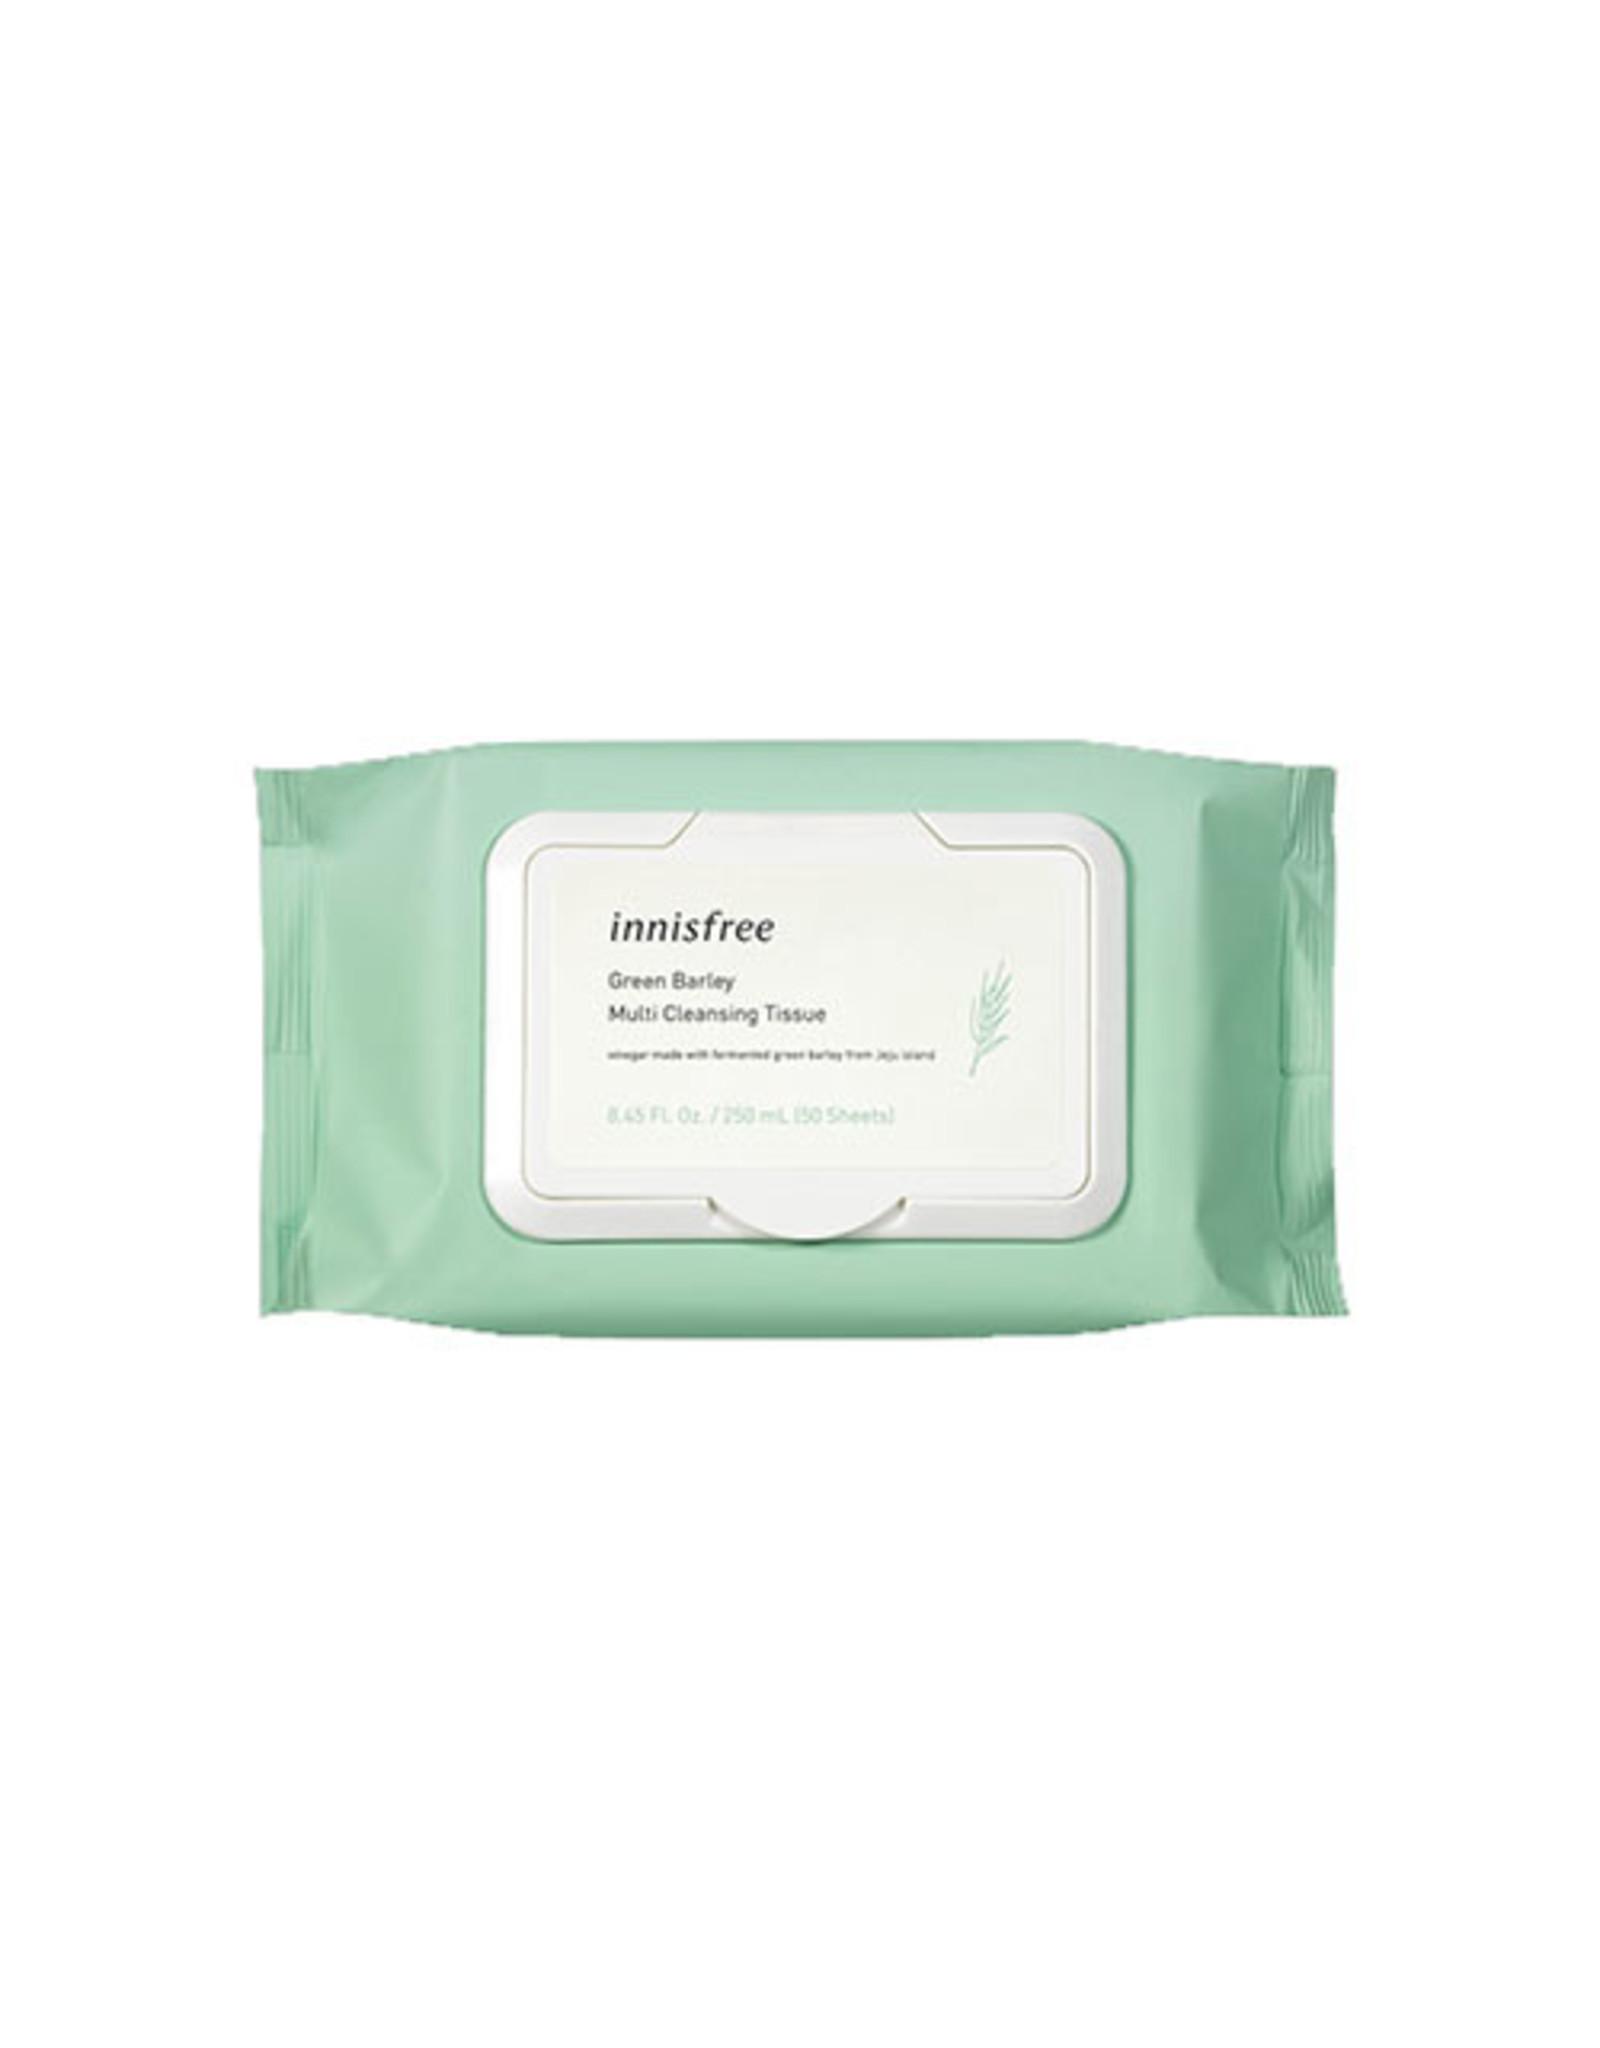 Innisfree Innisfree Green Barley Multi Cleansing Tissue 50sheets